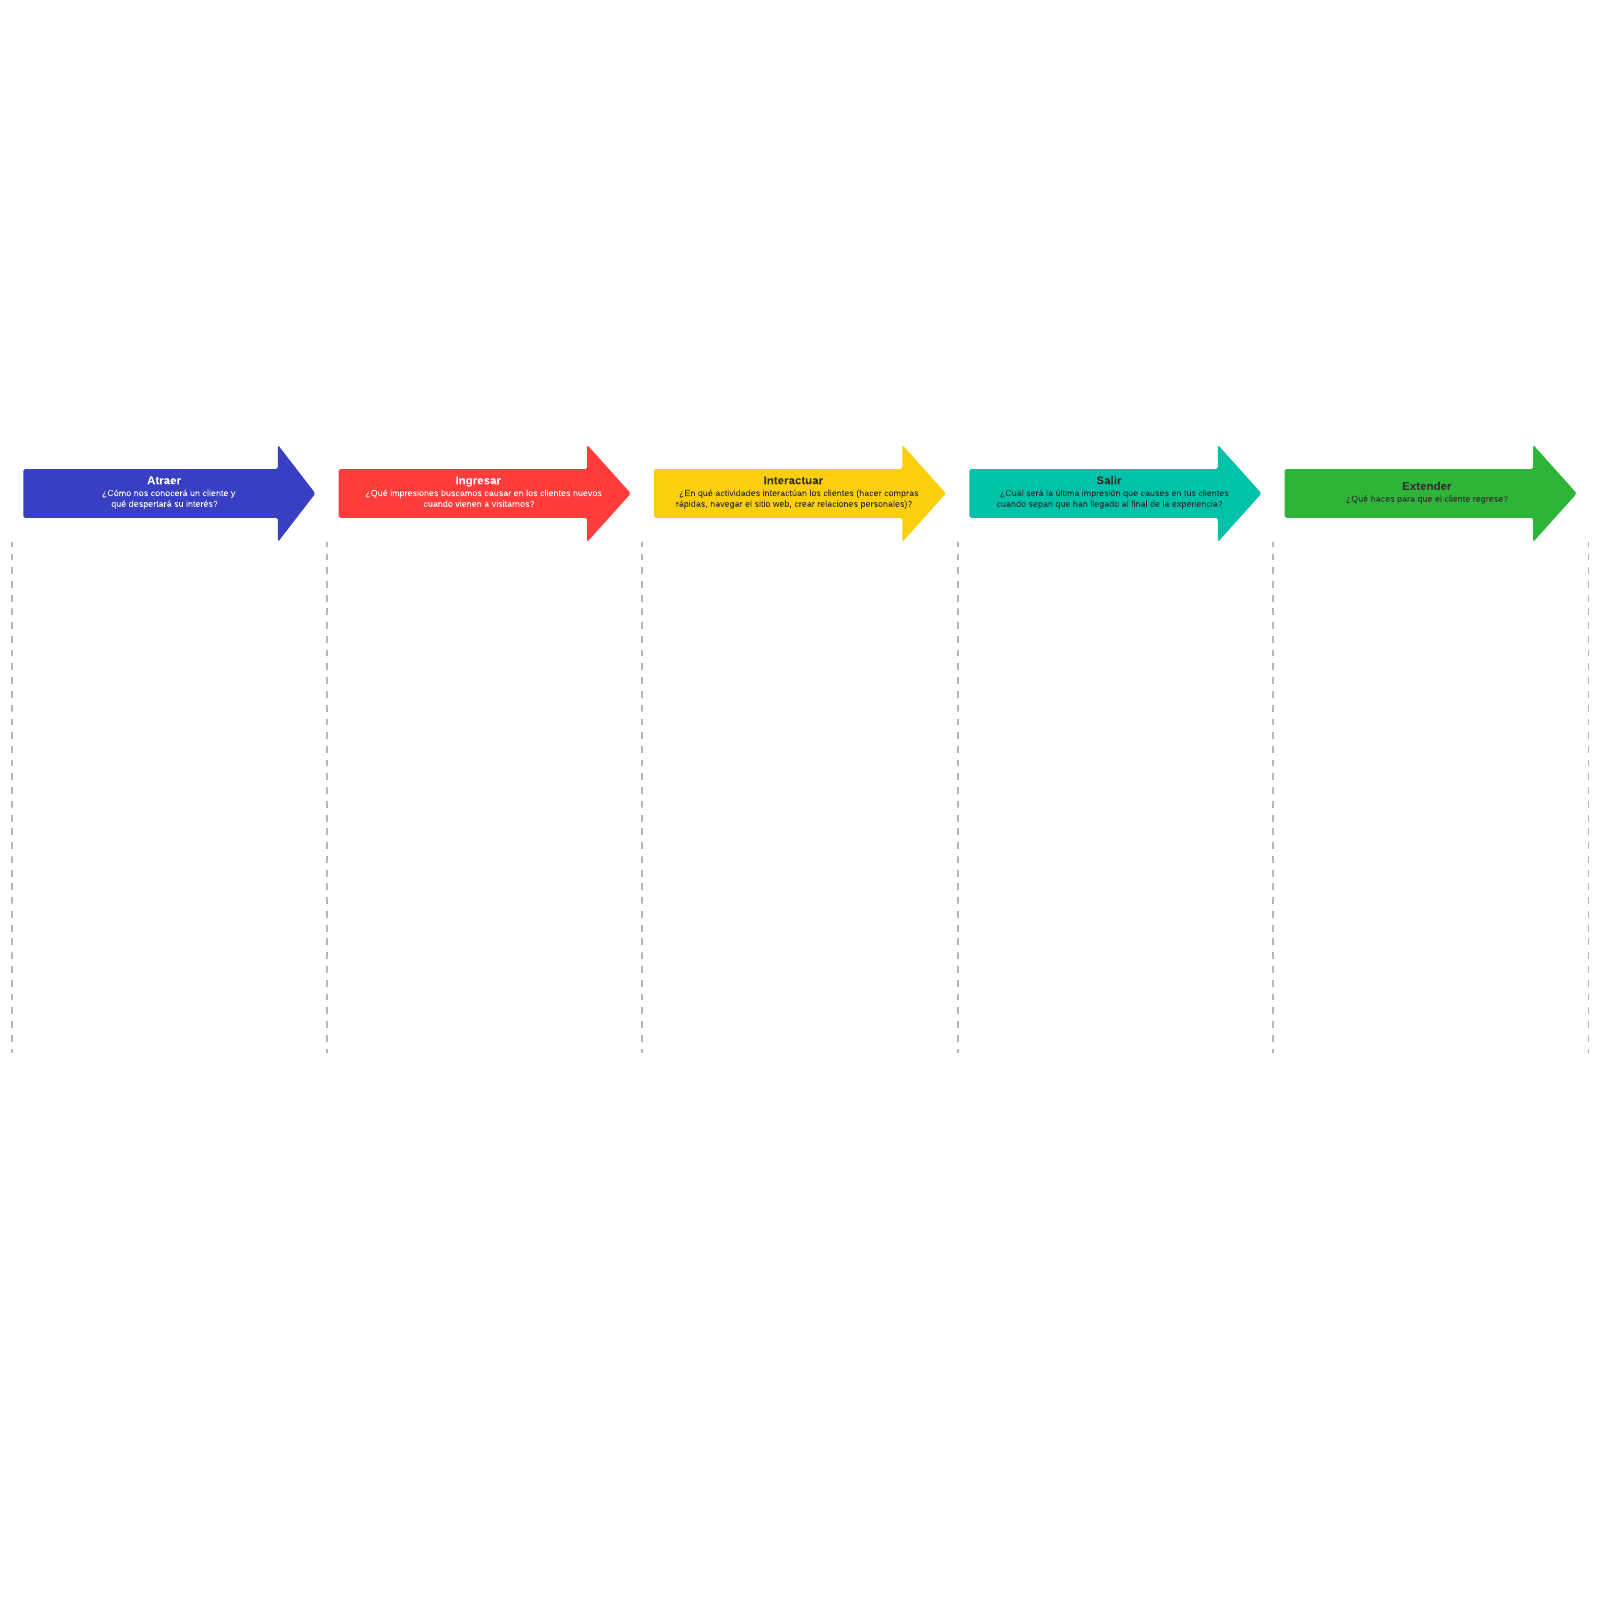 Las 5 E del recorrido del cliente